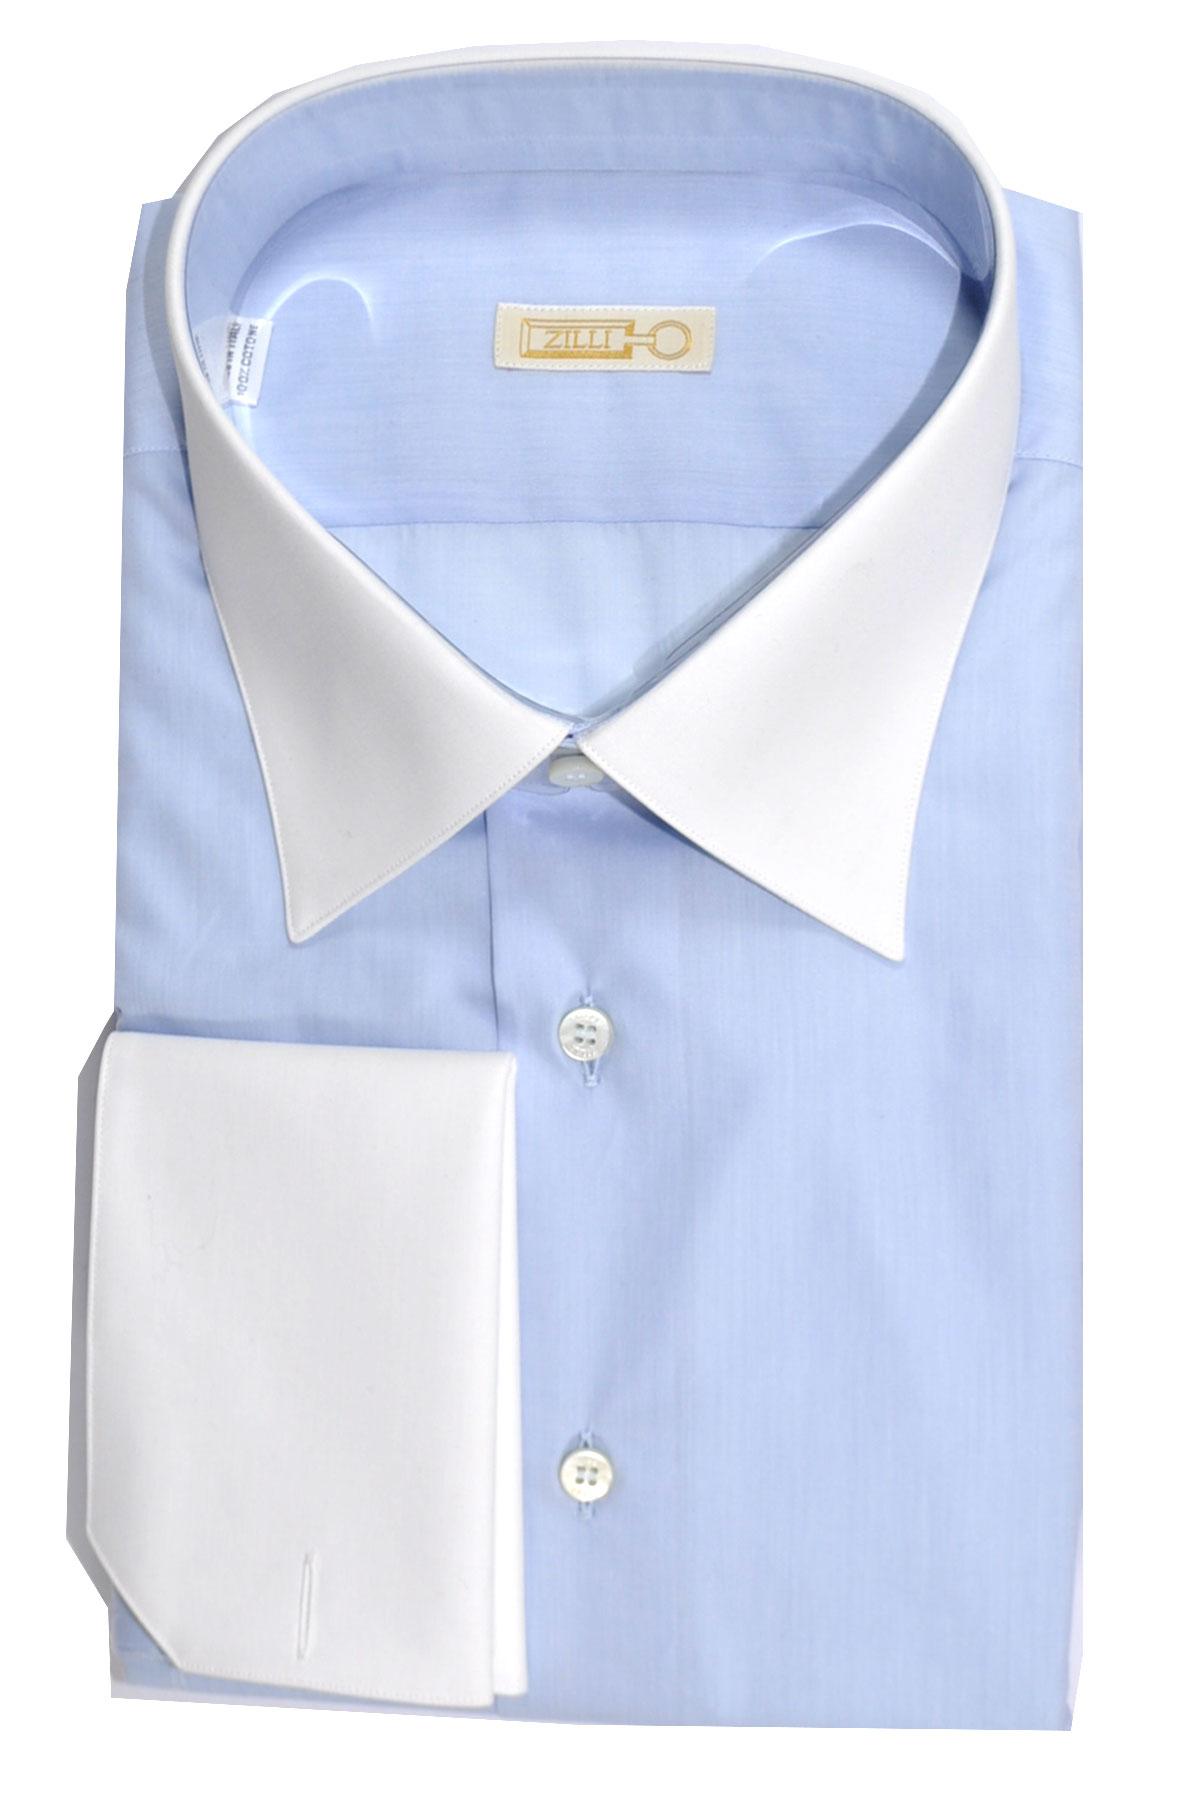 Men Designer Shirts Mens Bespoke Dress Shirts Sale